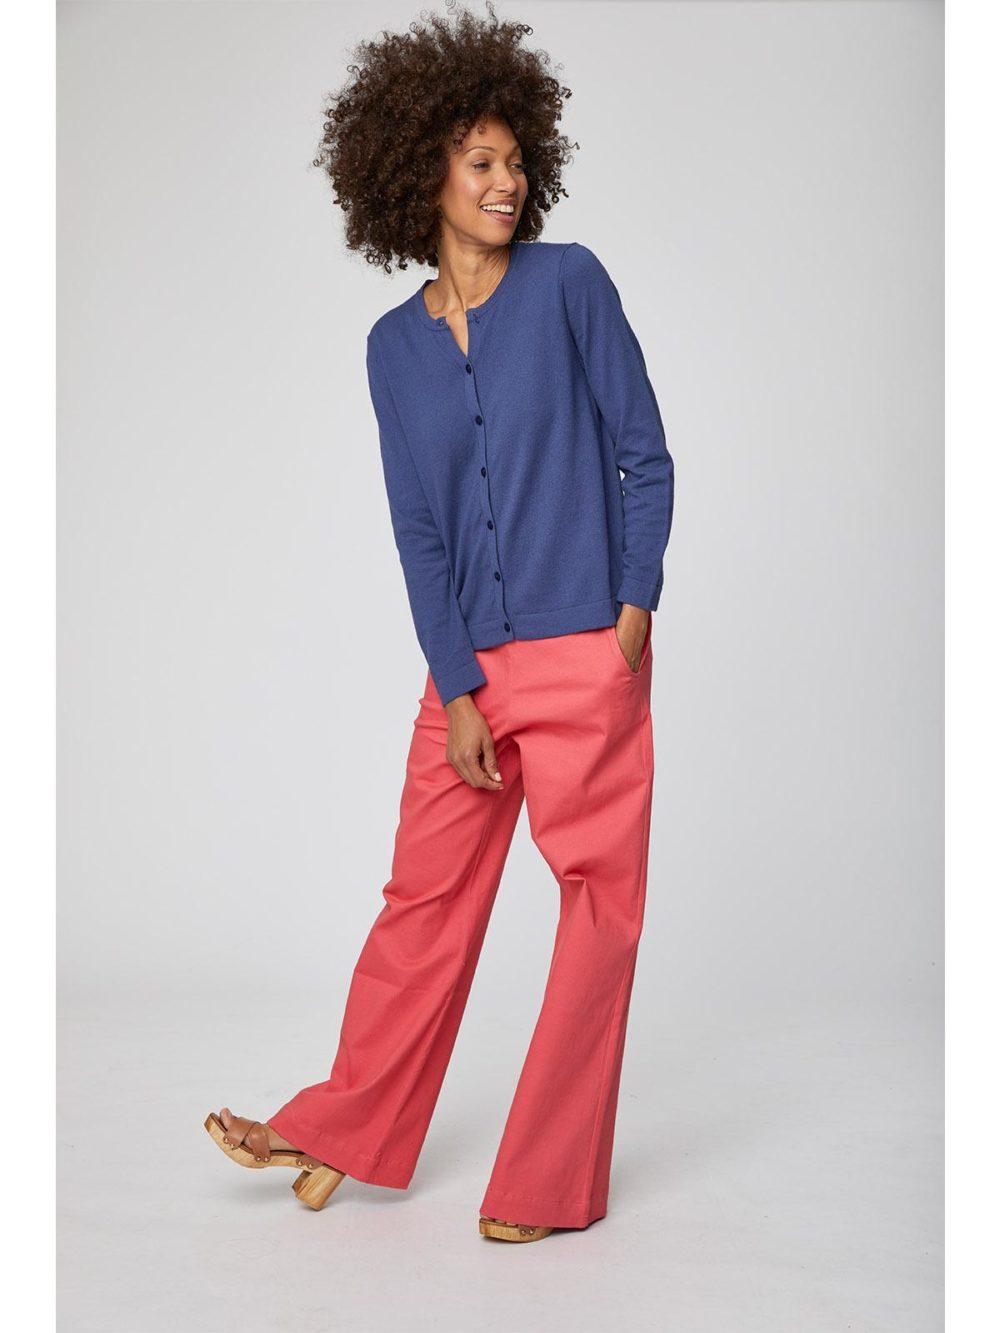 Grehta Cardigan Thought Clothing Katie Kerr Women's Clothing